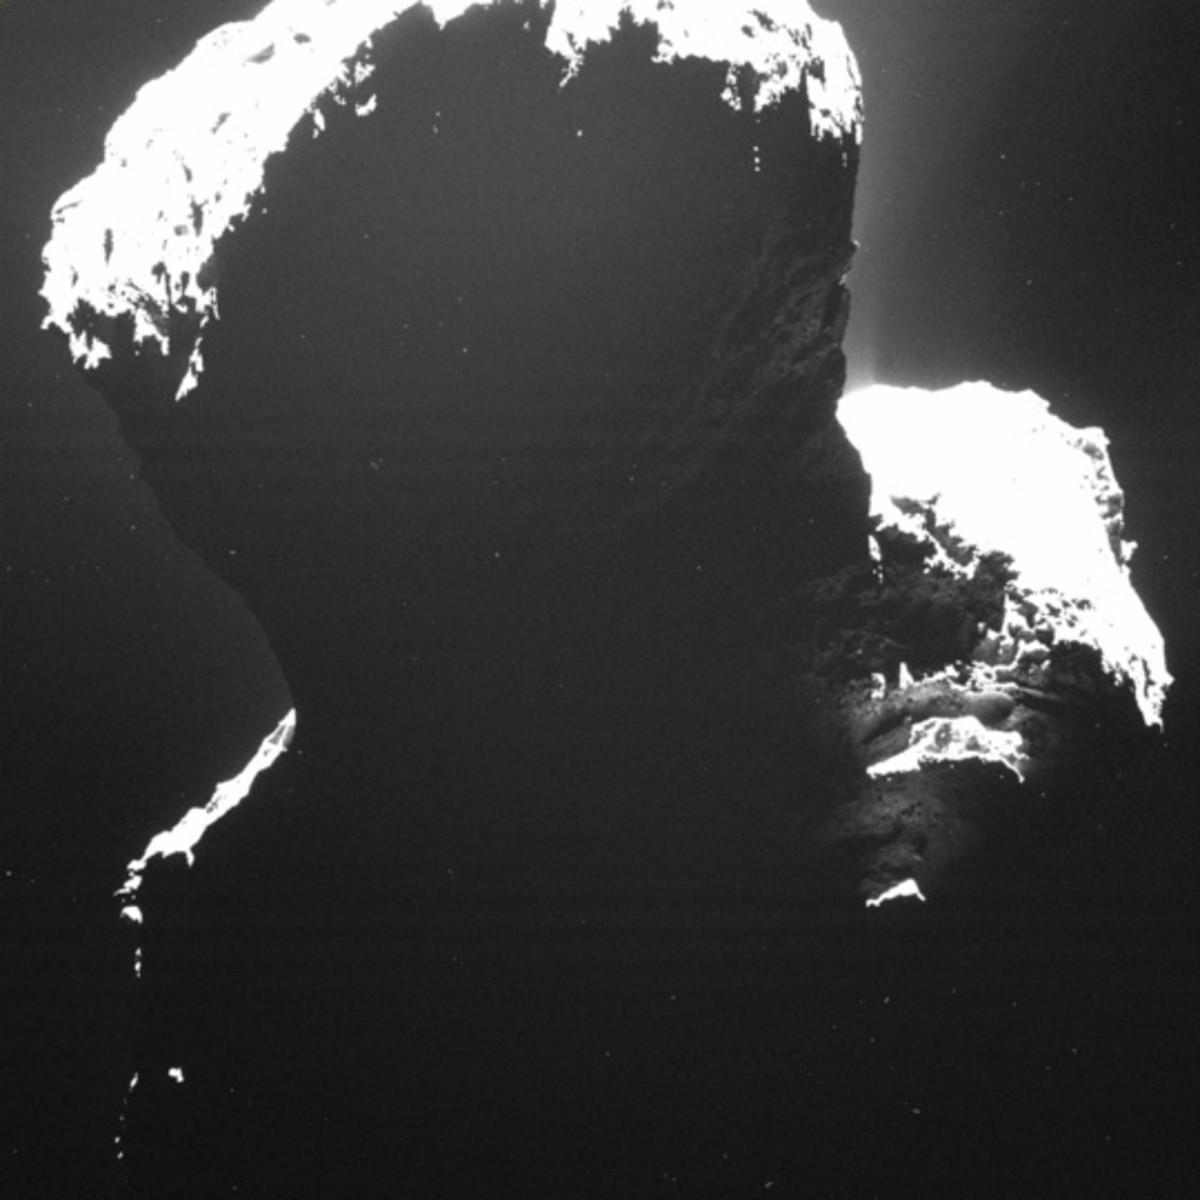 67P backlit, revealing its dark side.